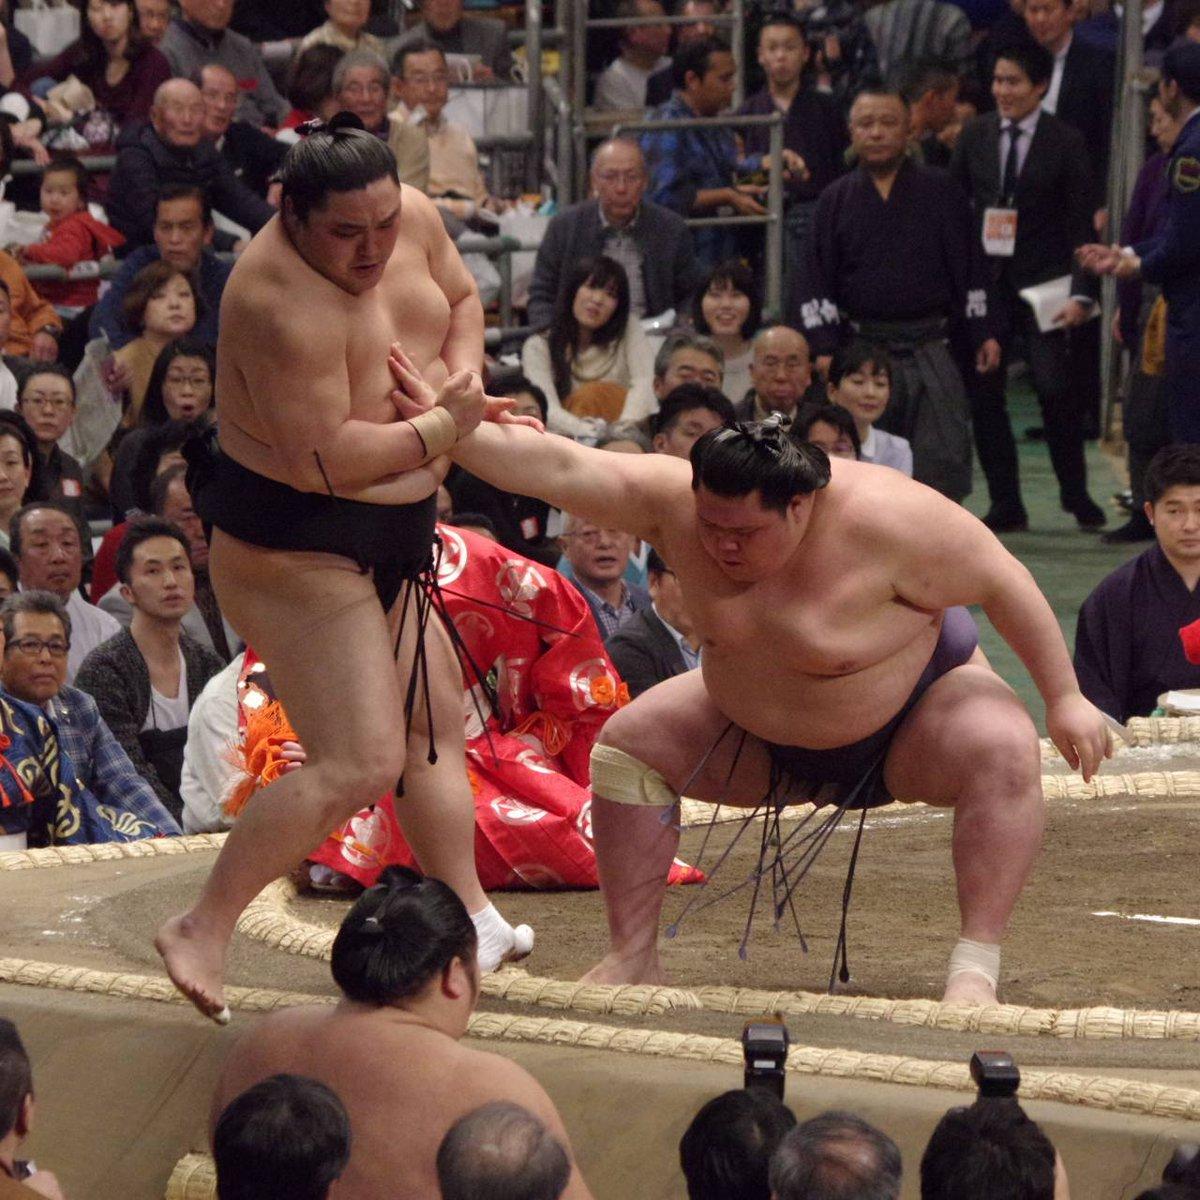 test ツイッターメディア - <初日の様子> 幕内取組。 阿武咲 押し出し 隠岐の海。 逸ノ城 突き落とし 千代大龍。 栃煌山 肩透かし 正代。#sumo #相撲 https://t.co/WommdWhVie